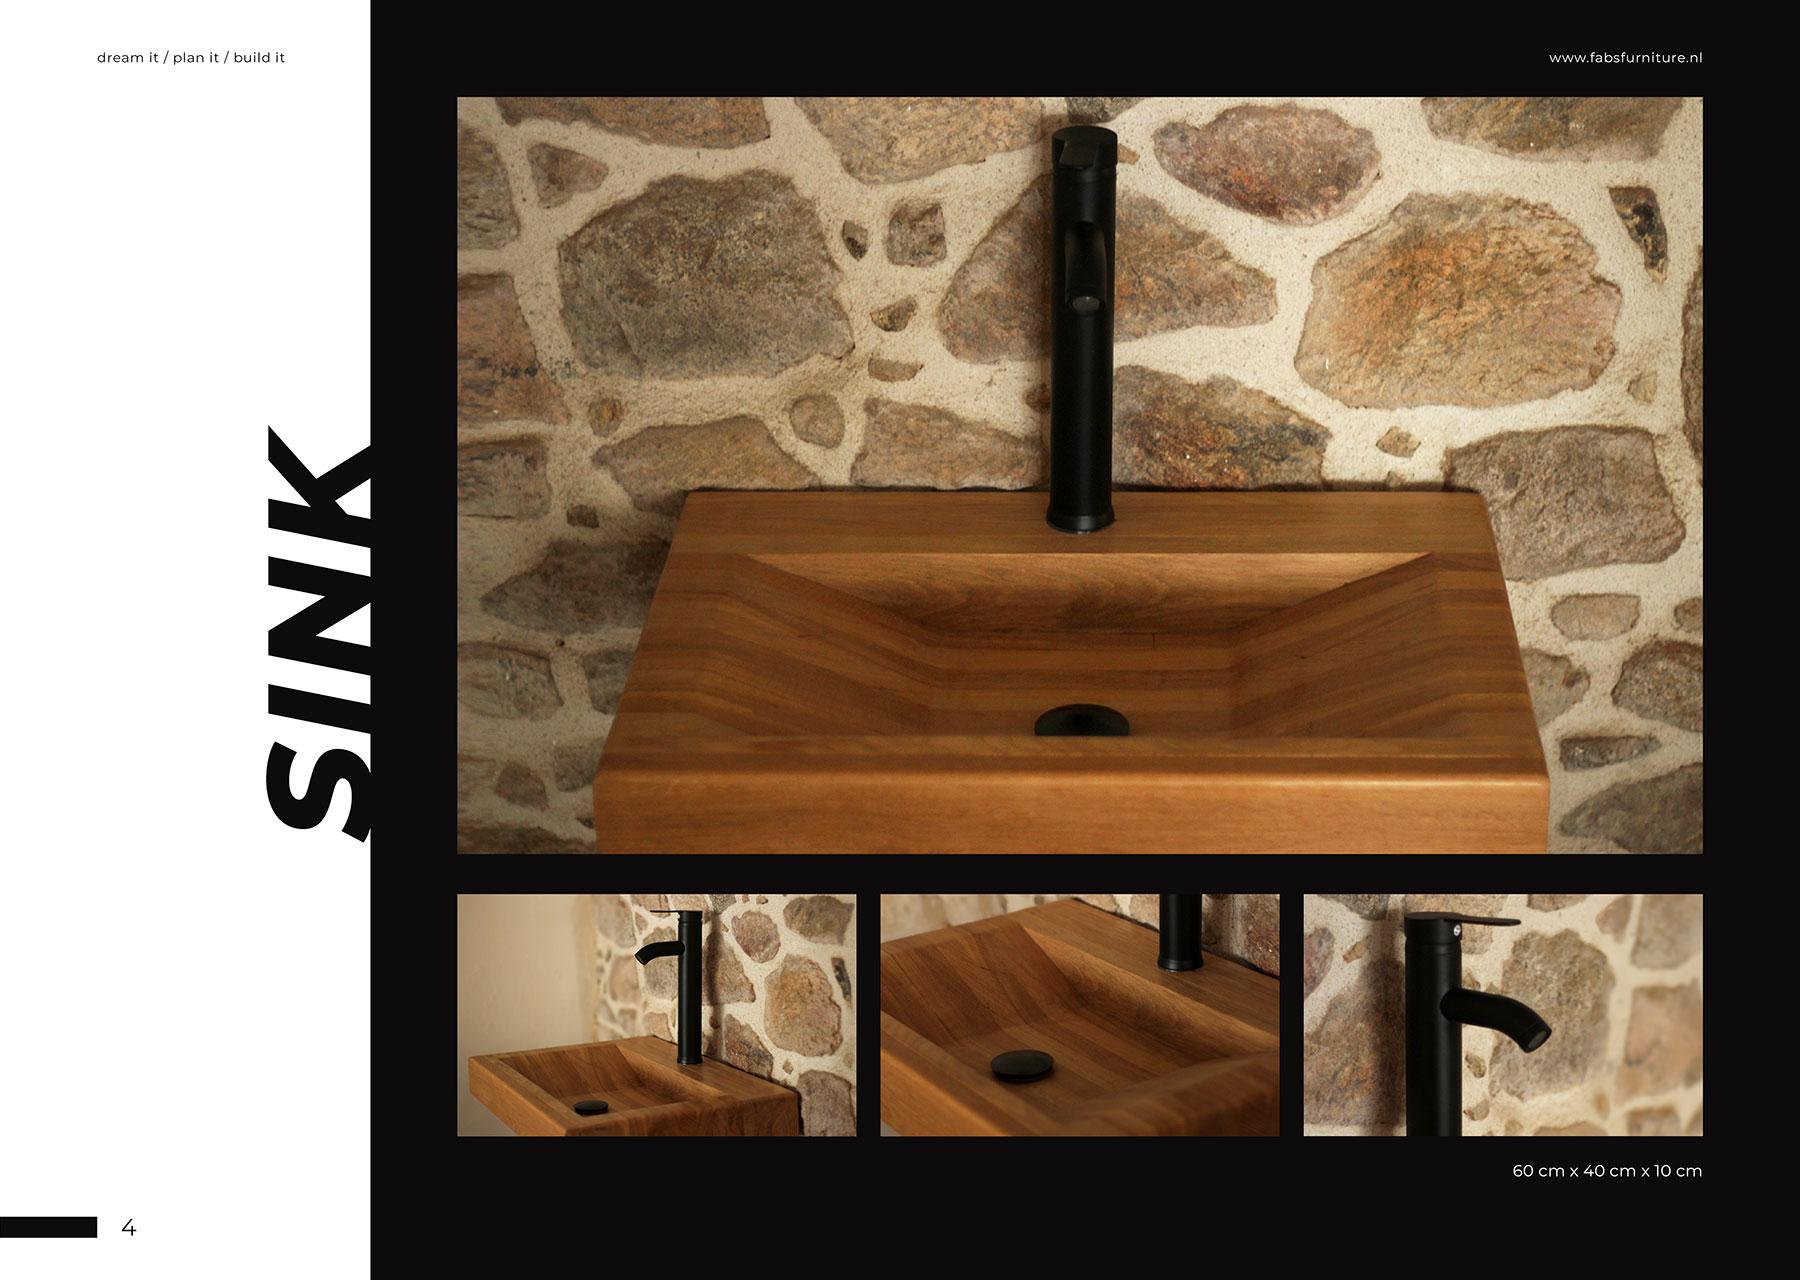 FabsFurniture Europe Portfolio - 2021 - wooden sink